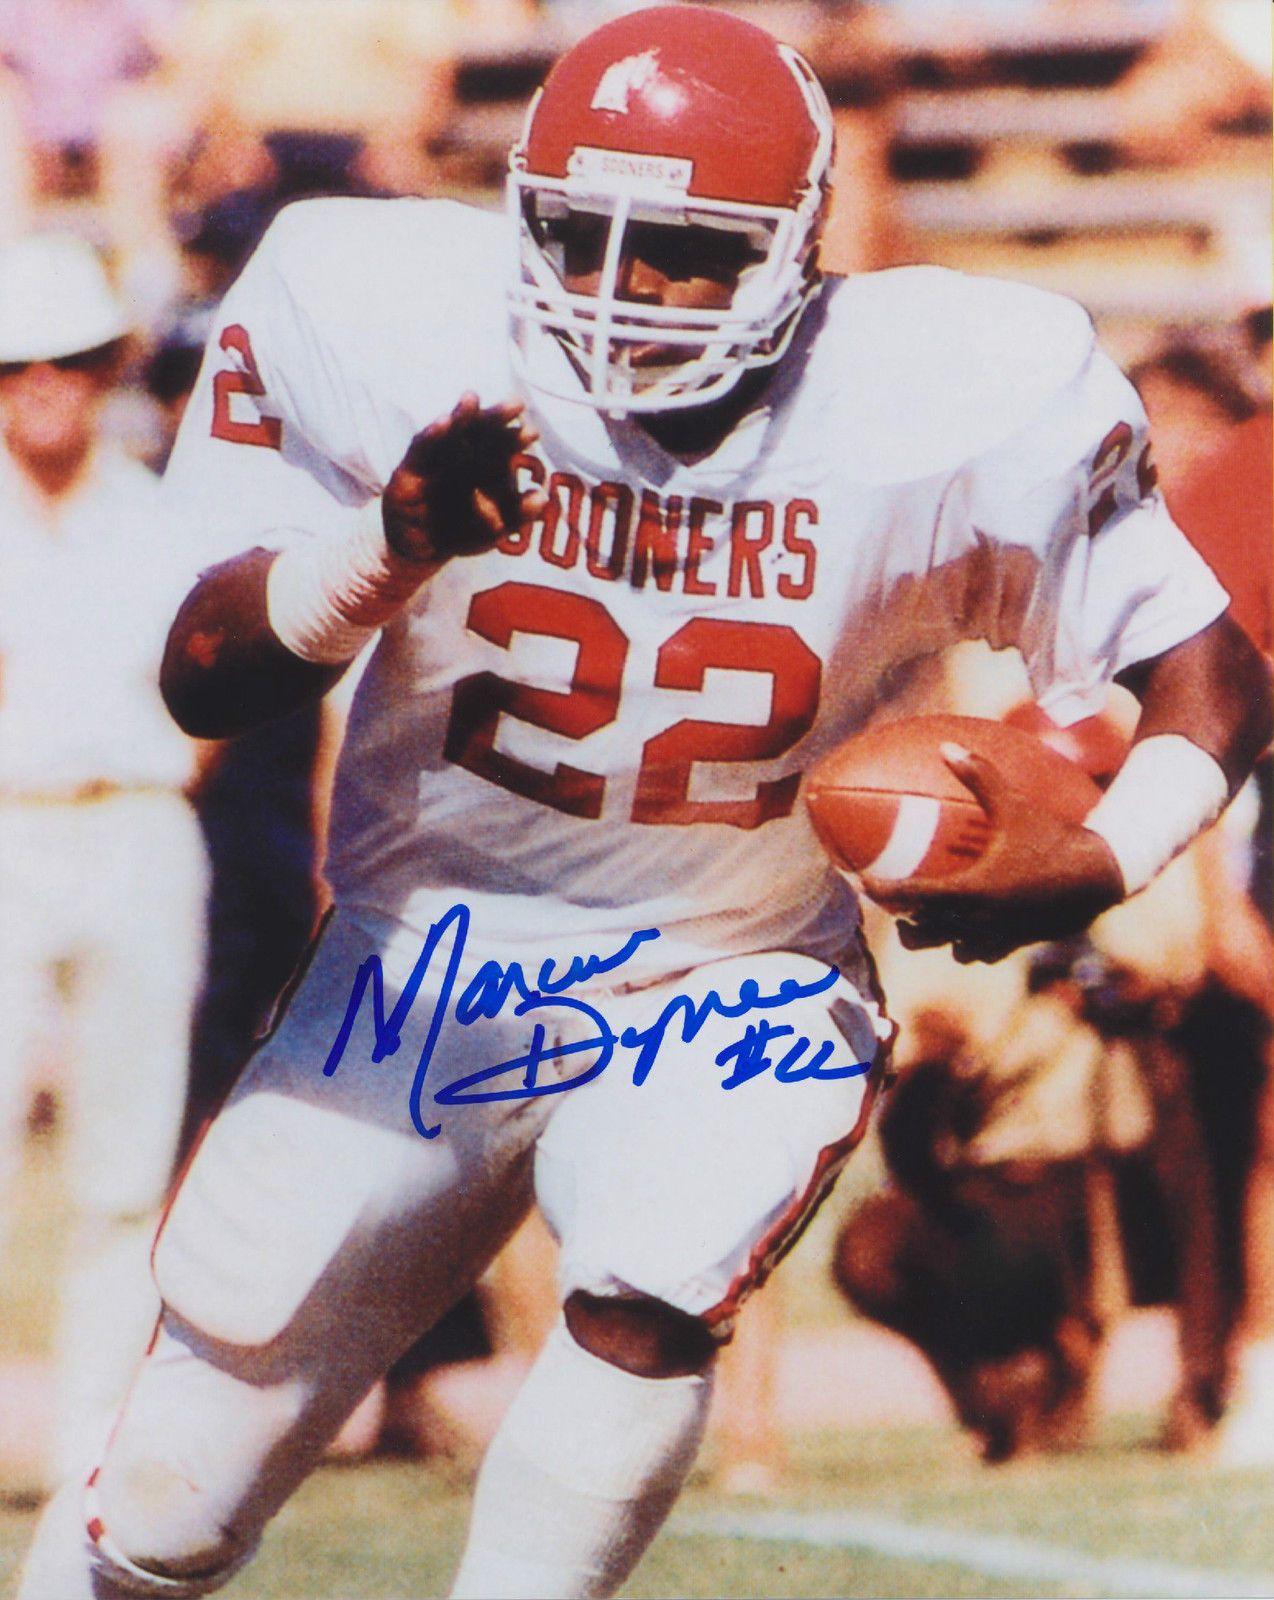 Marcus Dupree OU Oklahoma sooners football, Sooners